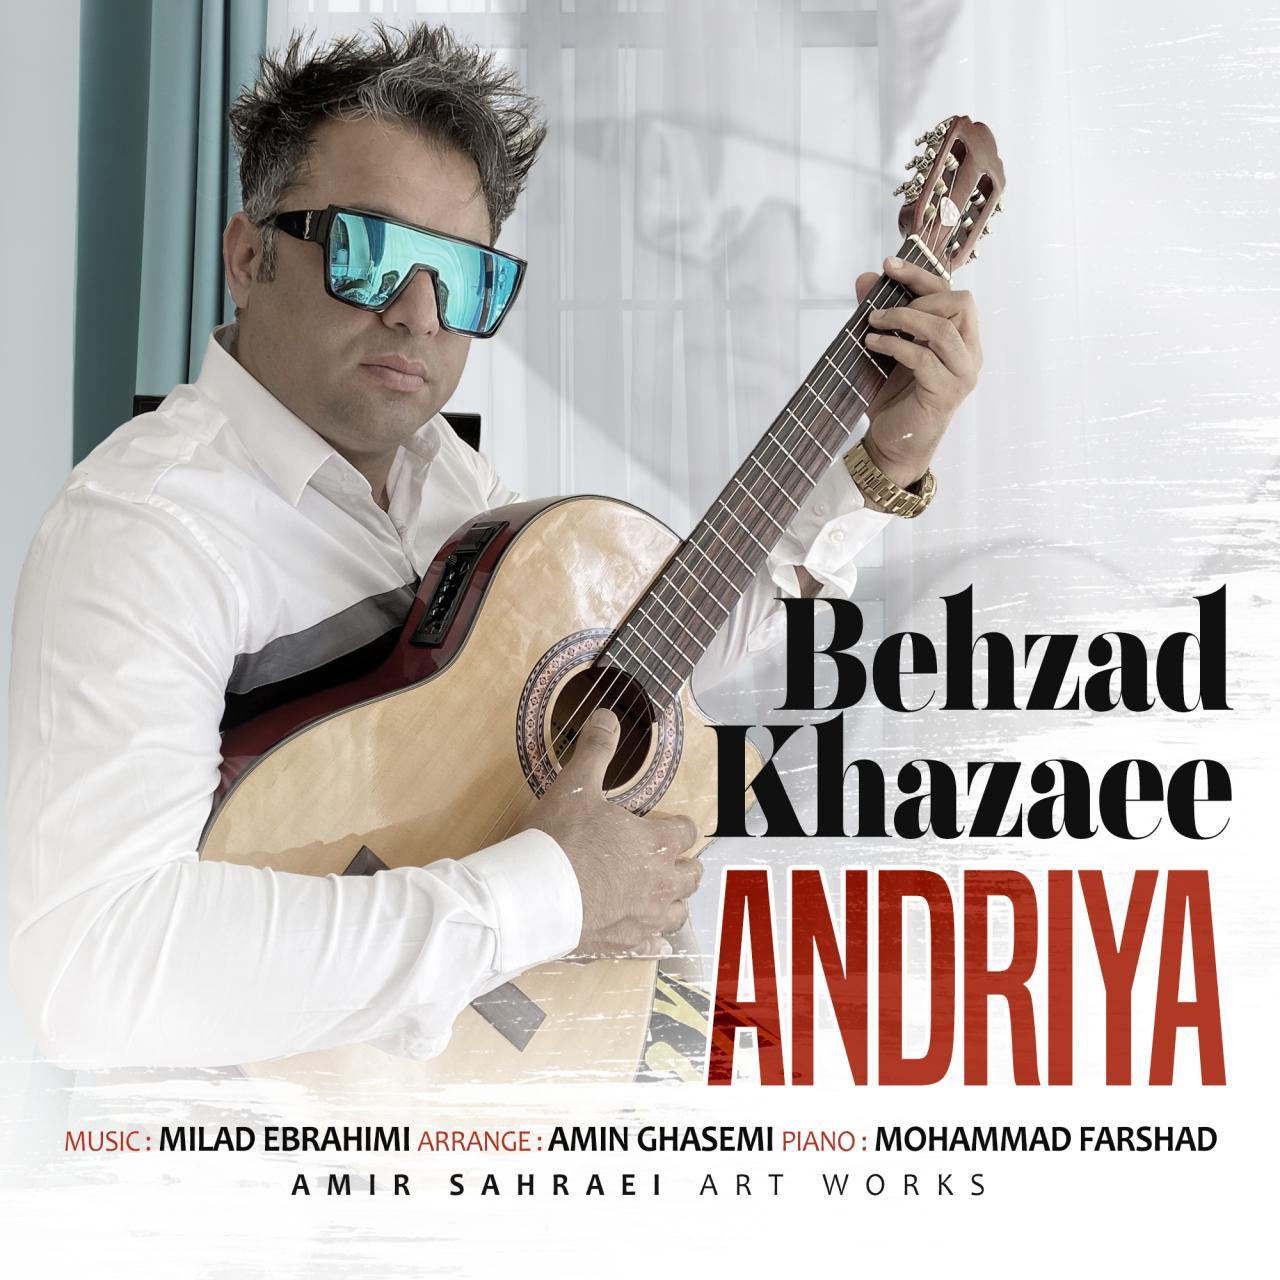 Behzad Khazaee – Andriya